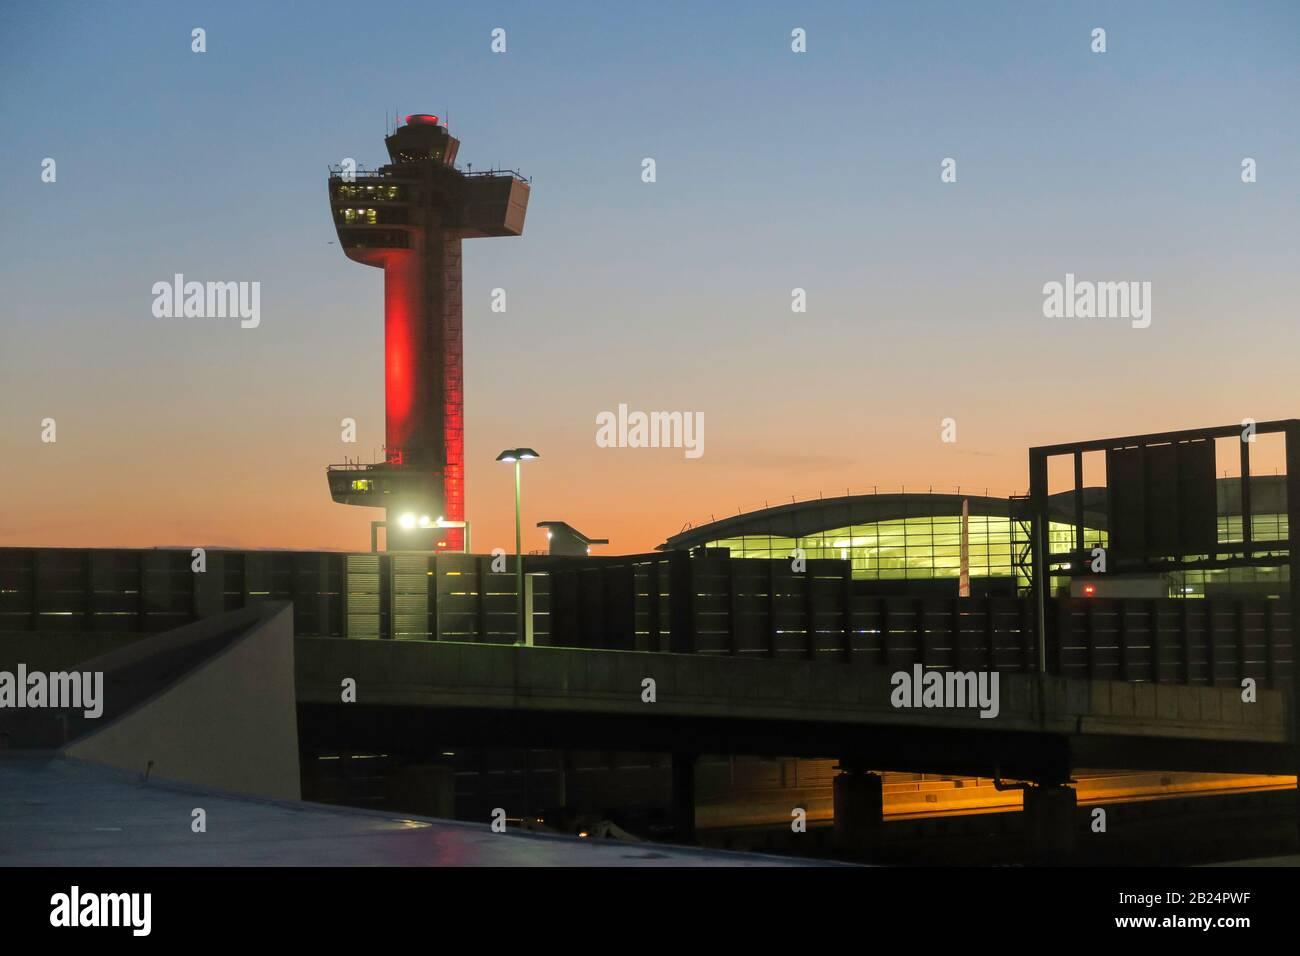 Air Traffic Control Tower at John F. Kennedy International Airport, NYC, USA Stock Photo